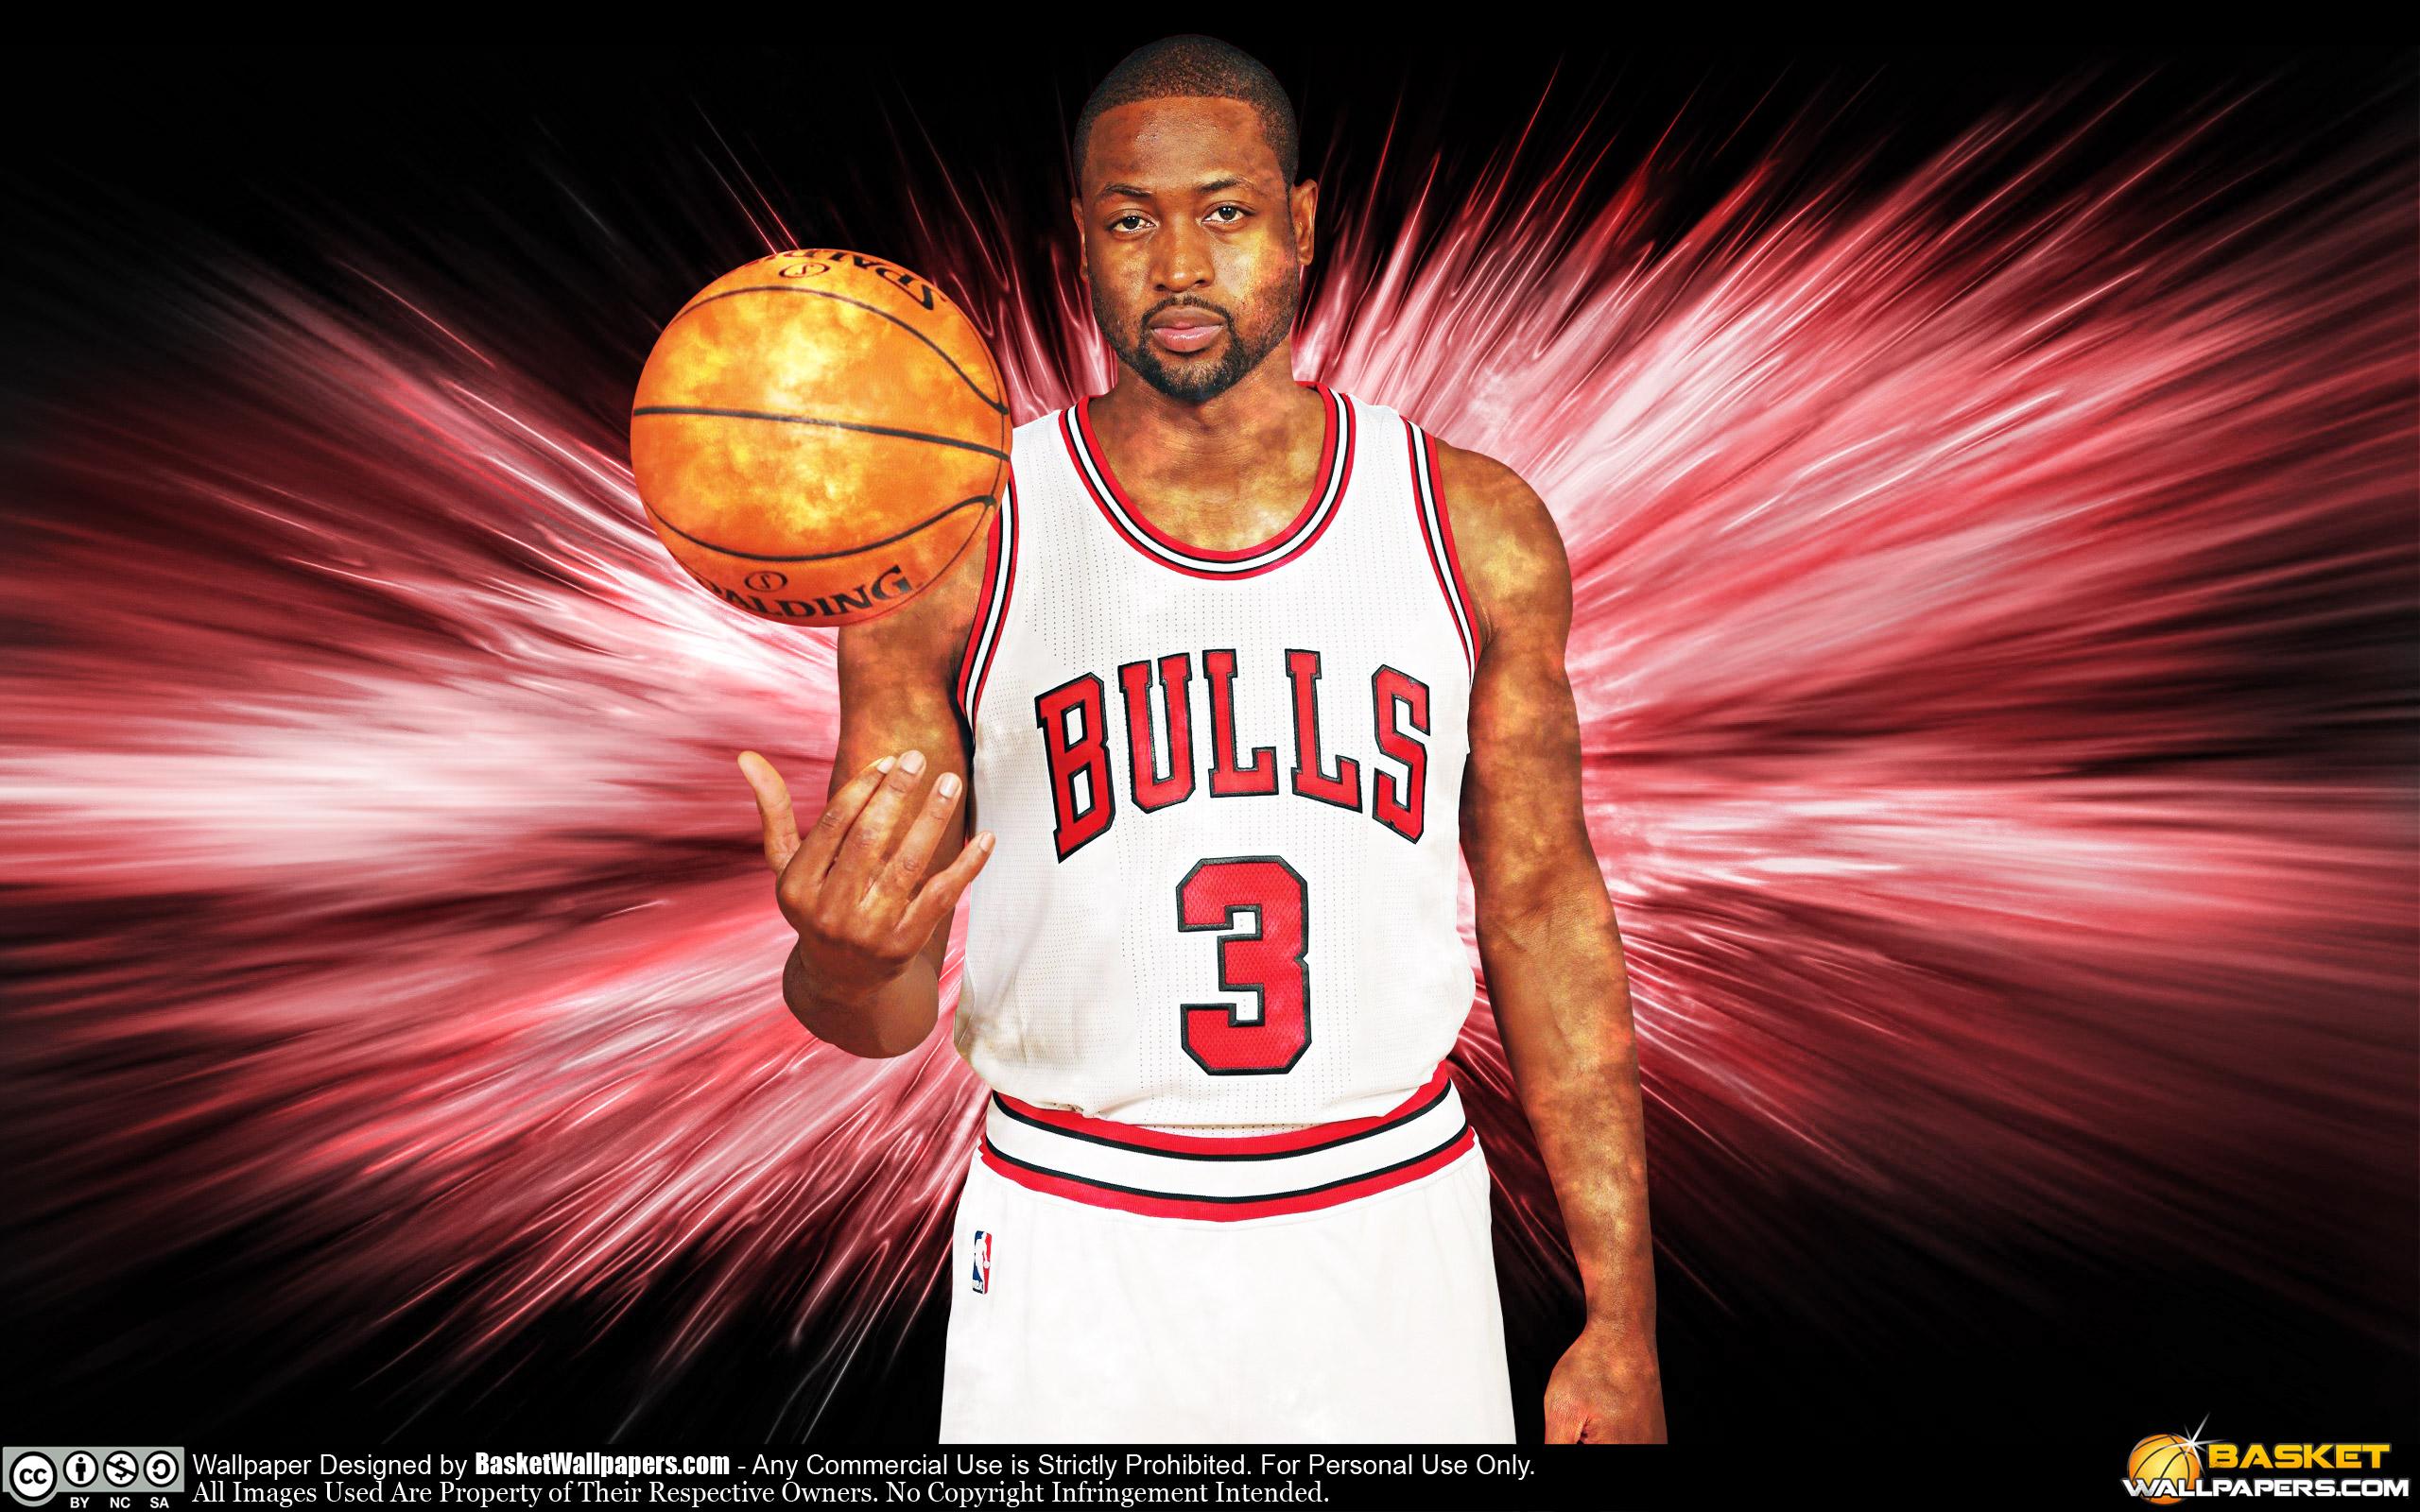 Dwyane Wade Chicago Bulls 2016 Wallpaper Basketball Wallpapers 2560x1600